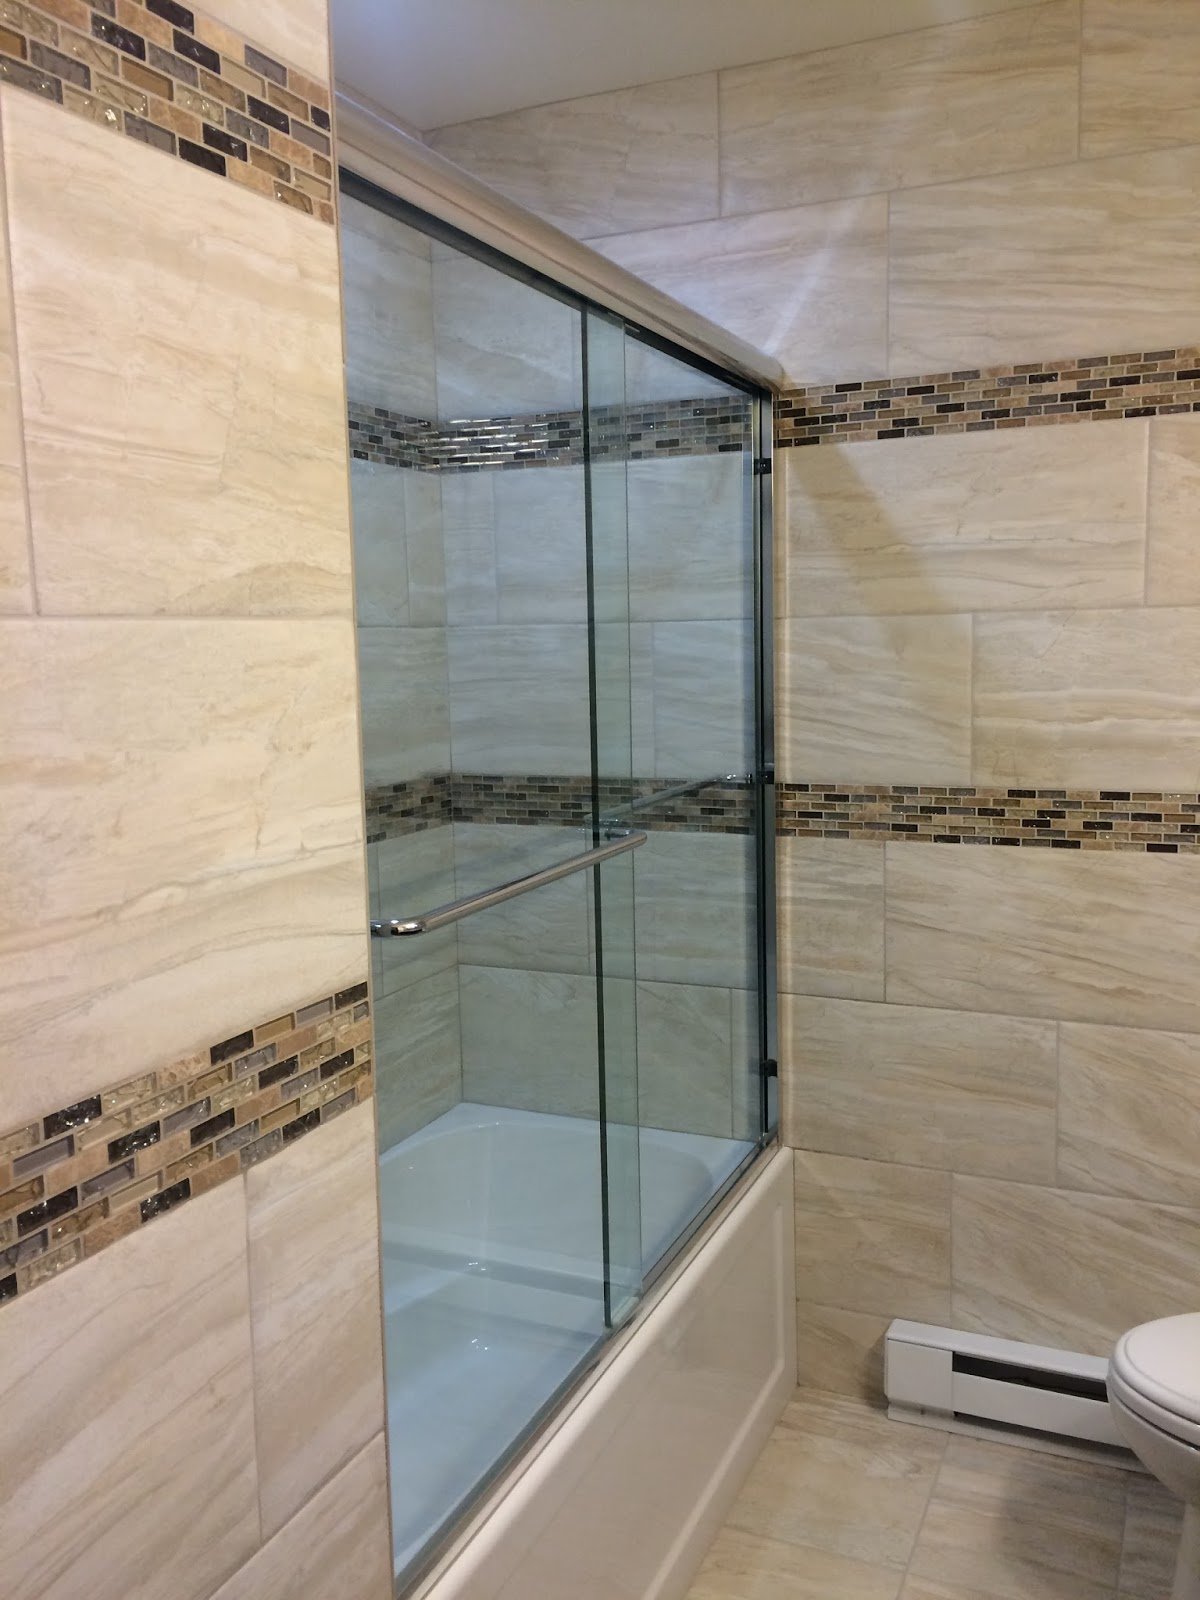 Ct Bath And Shower Custom Bathroom Remodeling Large Format Tile Install W